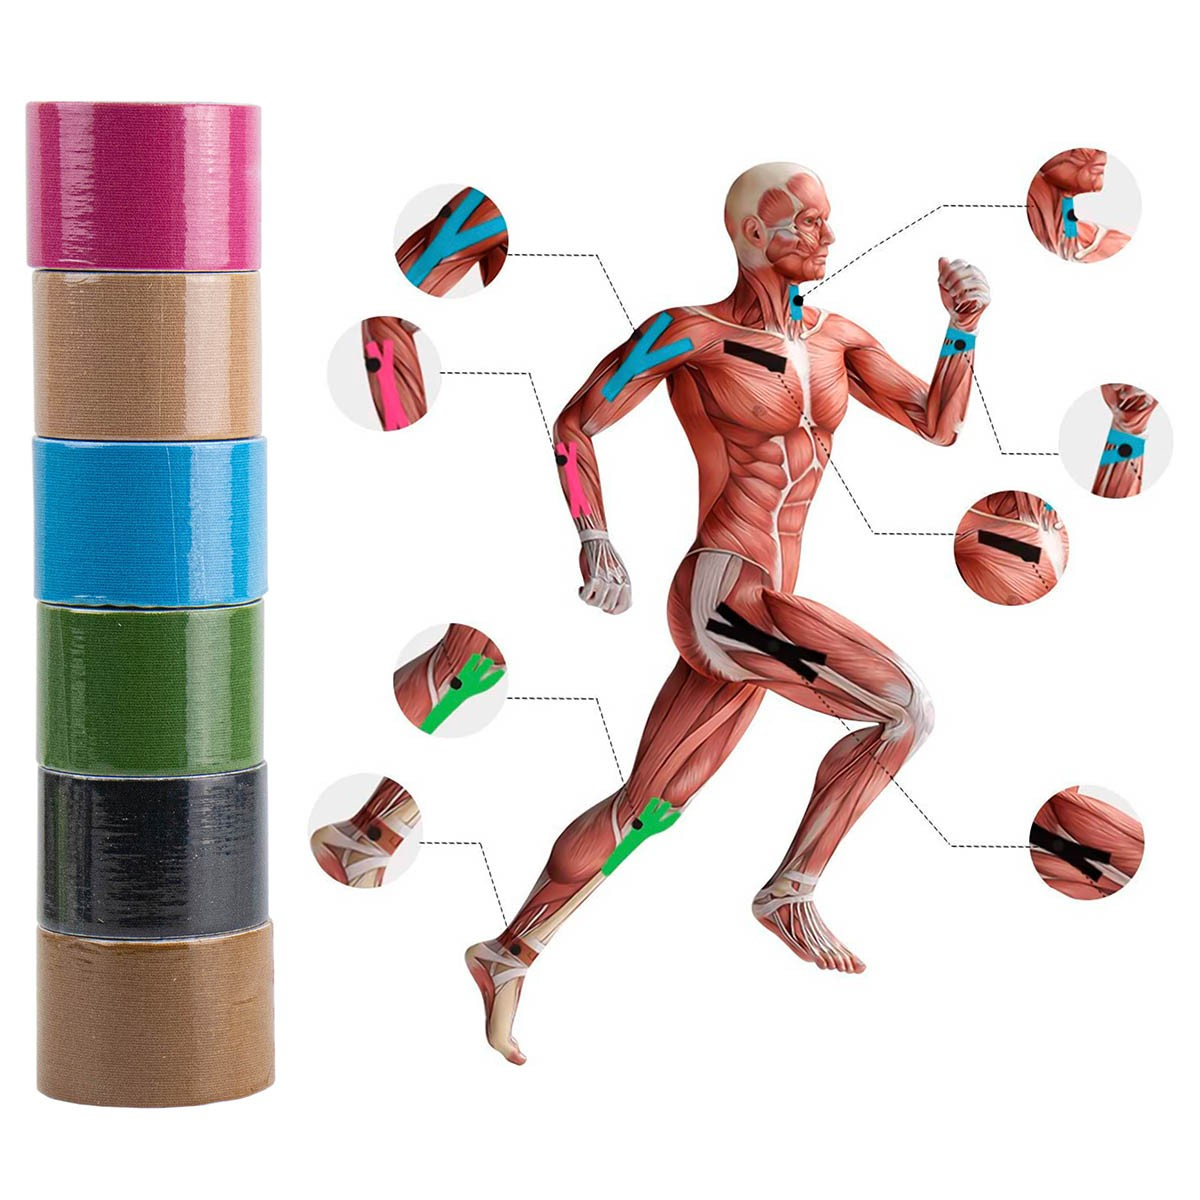 Bandagem Elástica Adesiva Fita Kinesio Funcional Neuromuscular Fitband MBFit MB87098